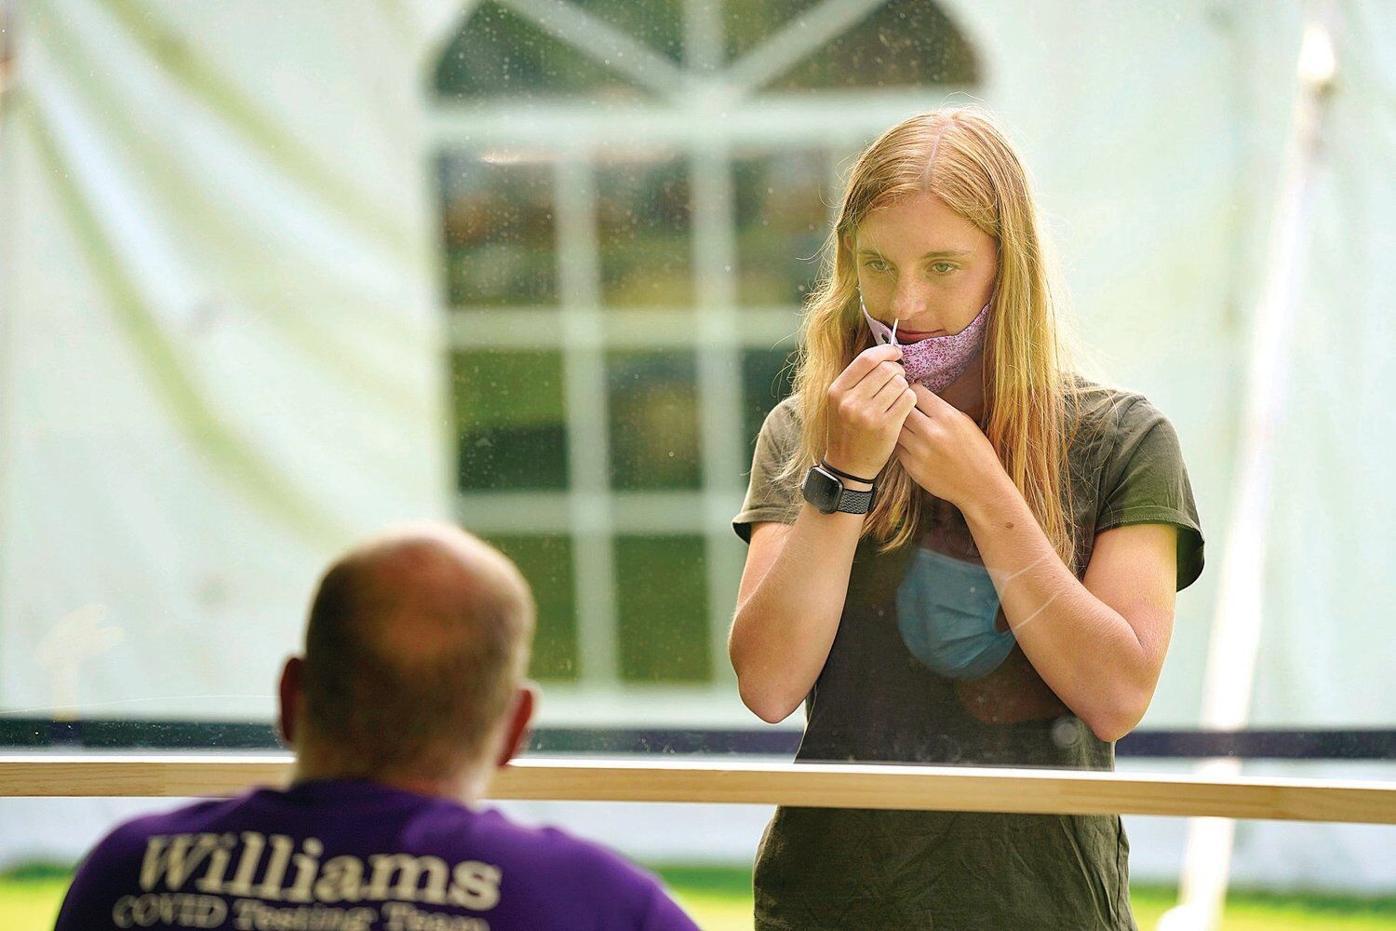 Williams College students return to campus pandemic precautions